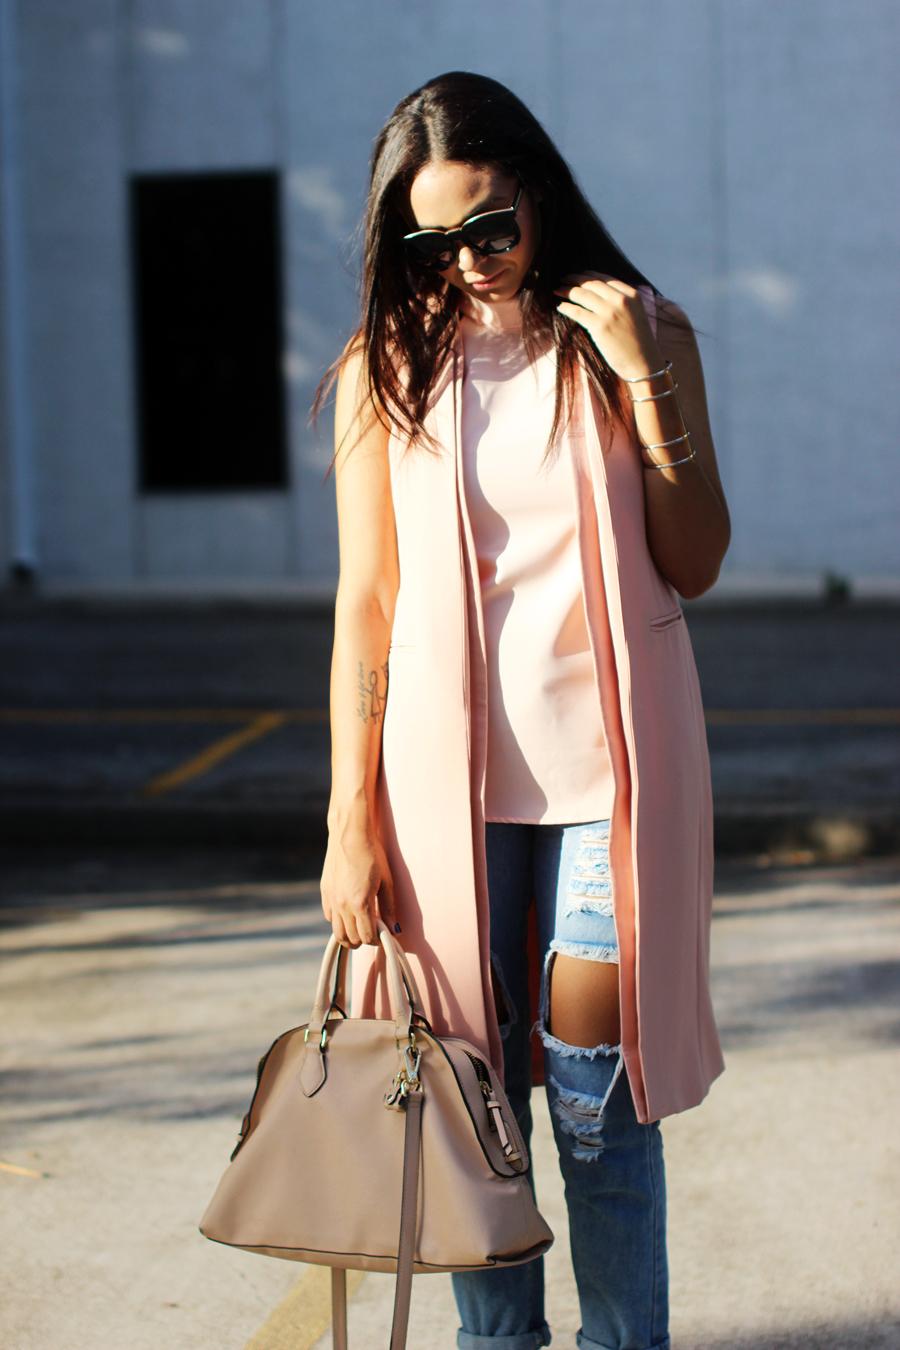 ftt-pink-vest-ripped-jeans-halter-4